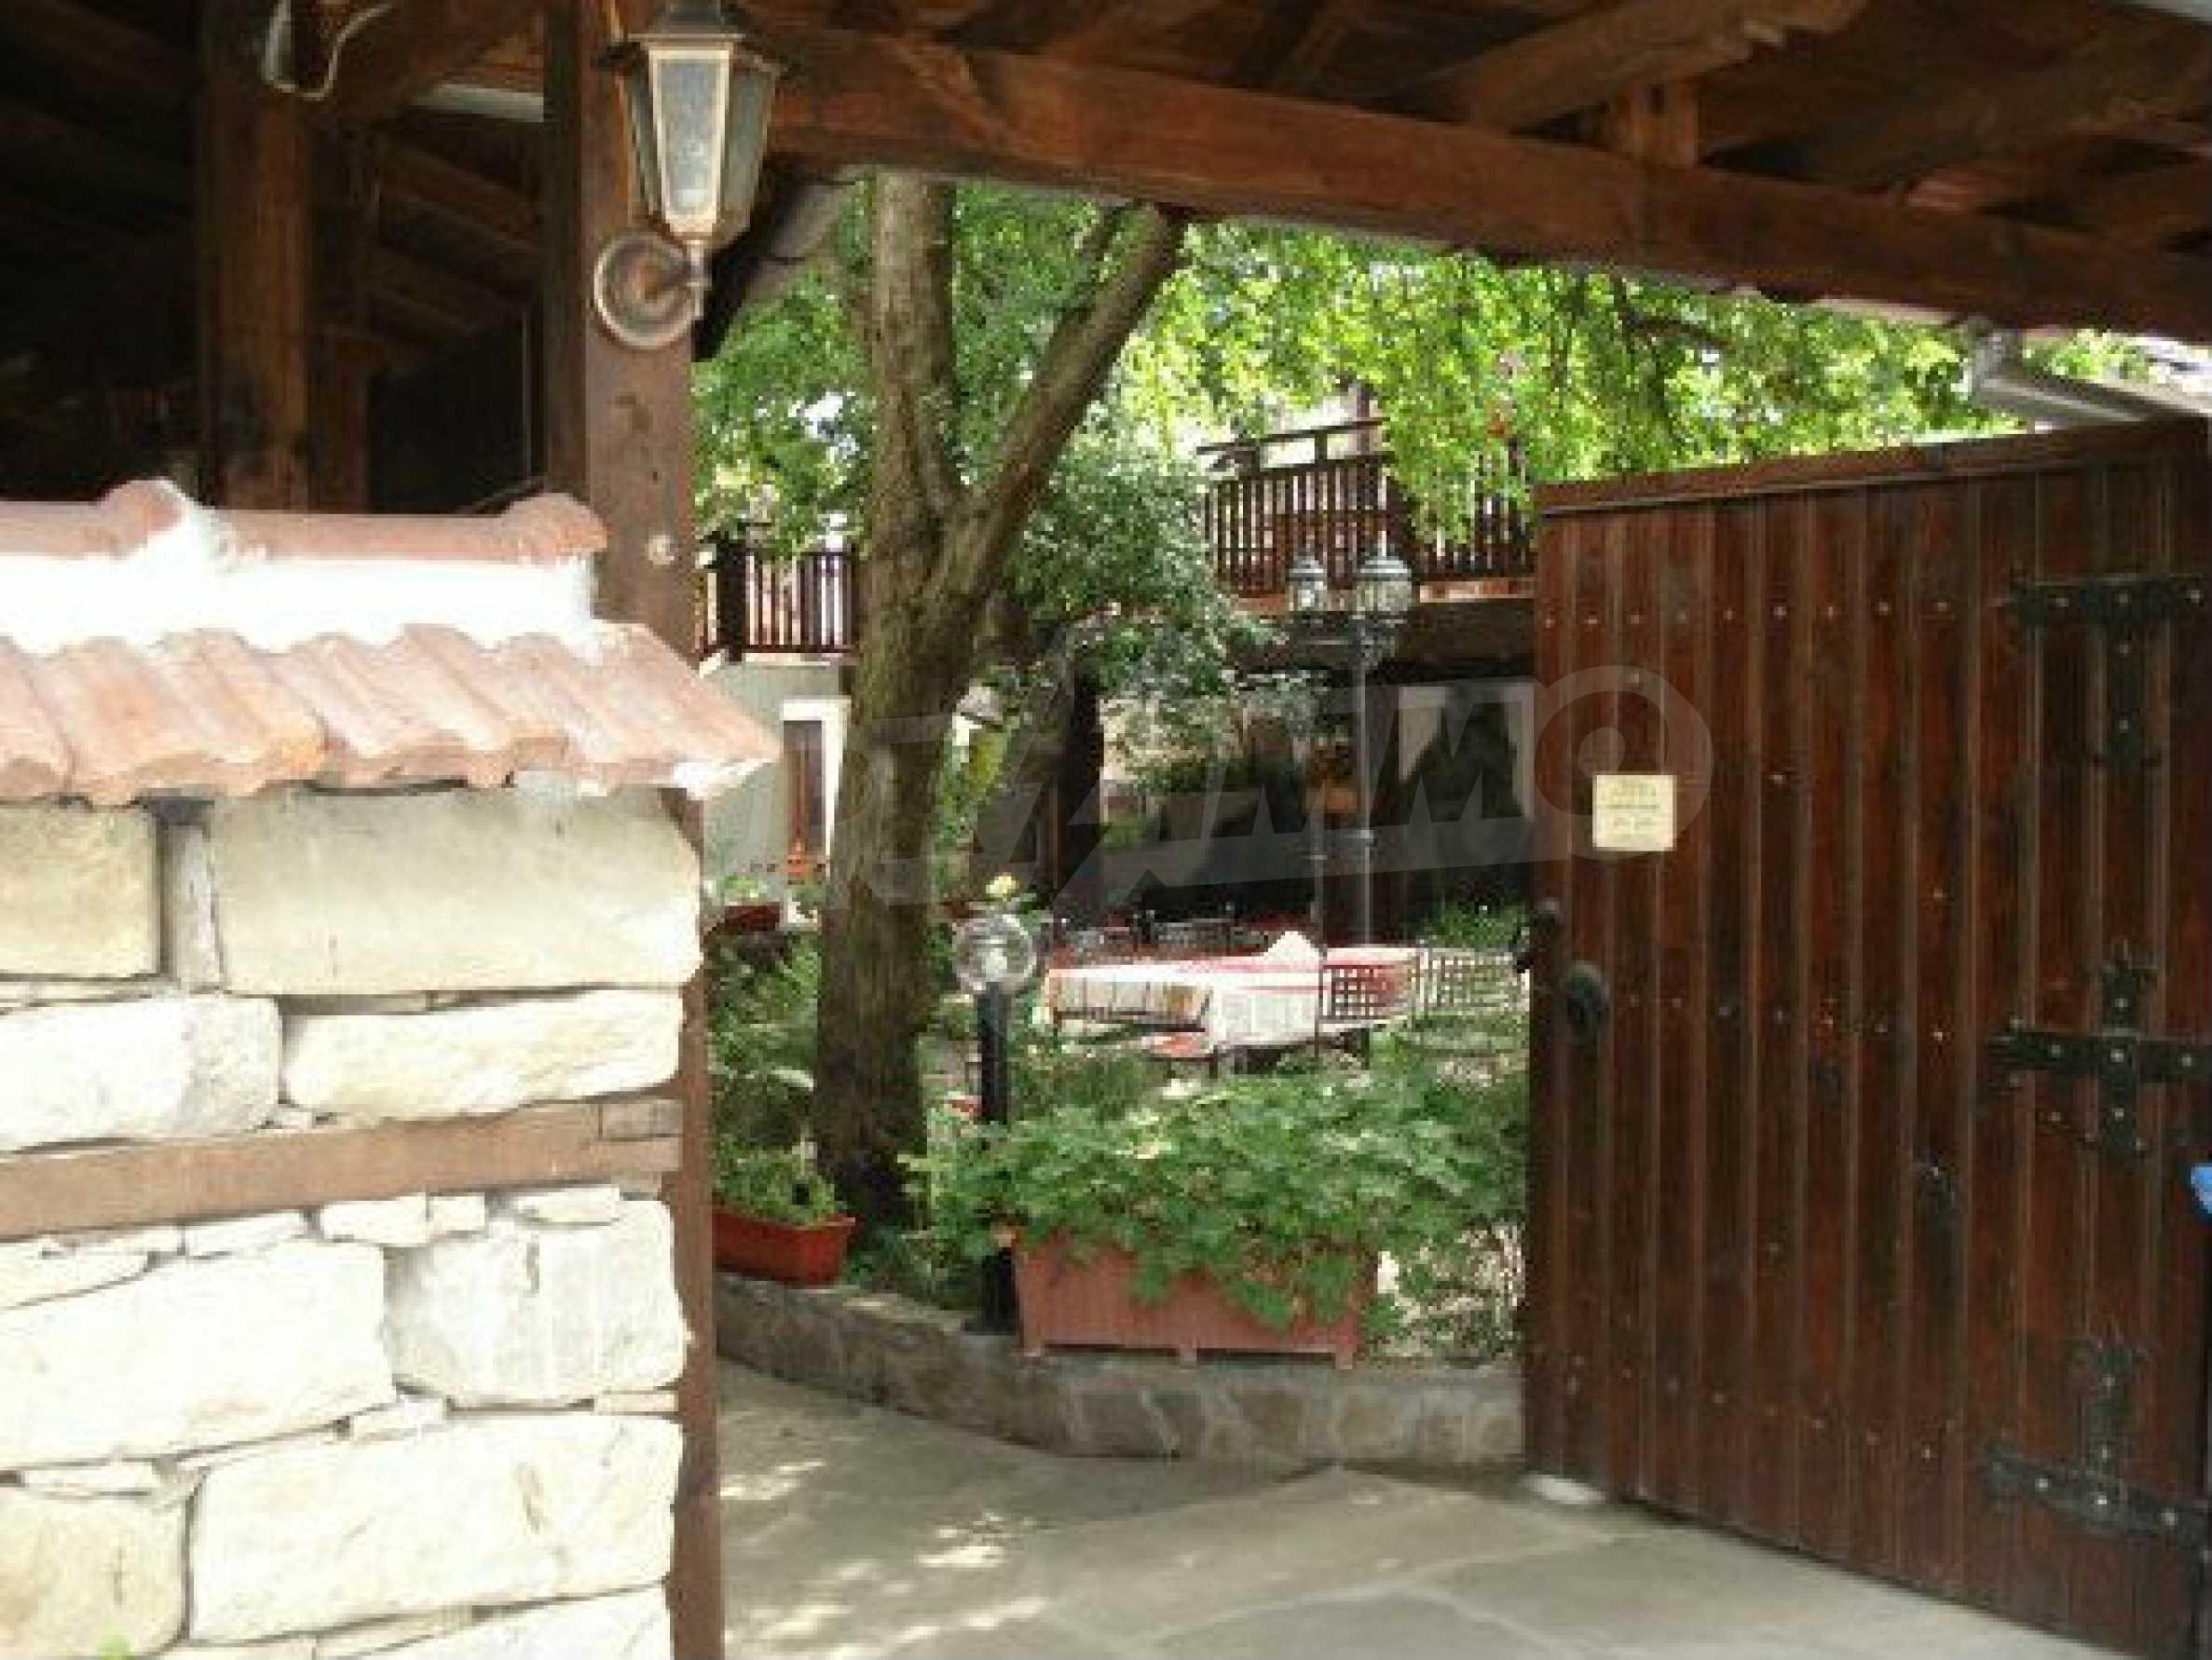 Hotelanlage mit Restaurant am Ufer des Flusses Osam in Lovech 52